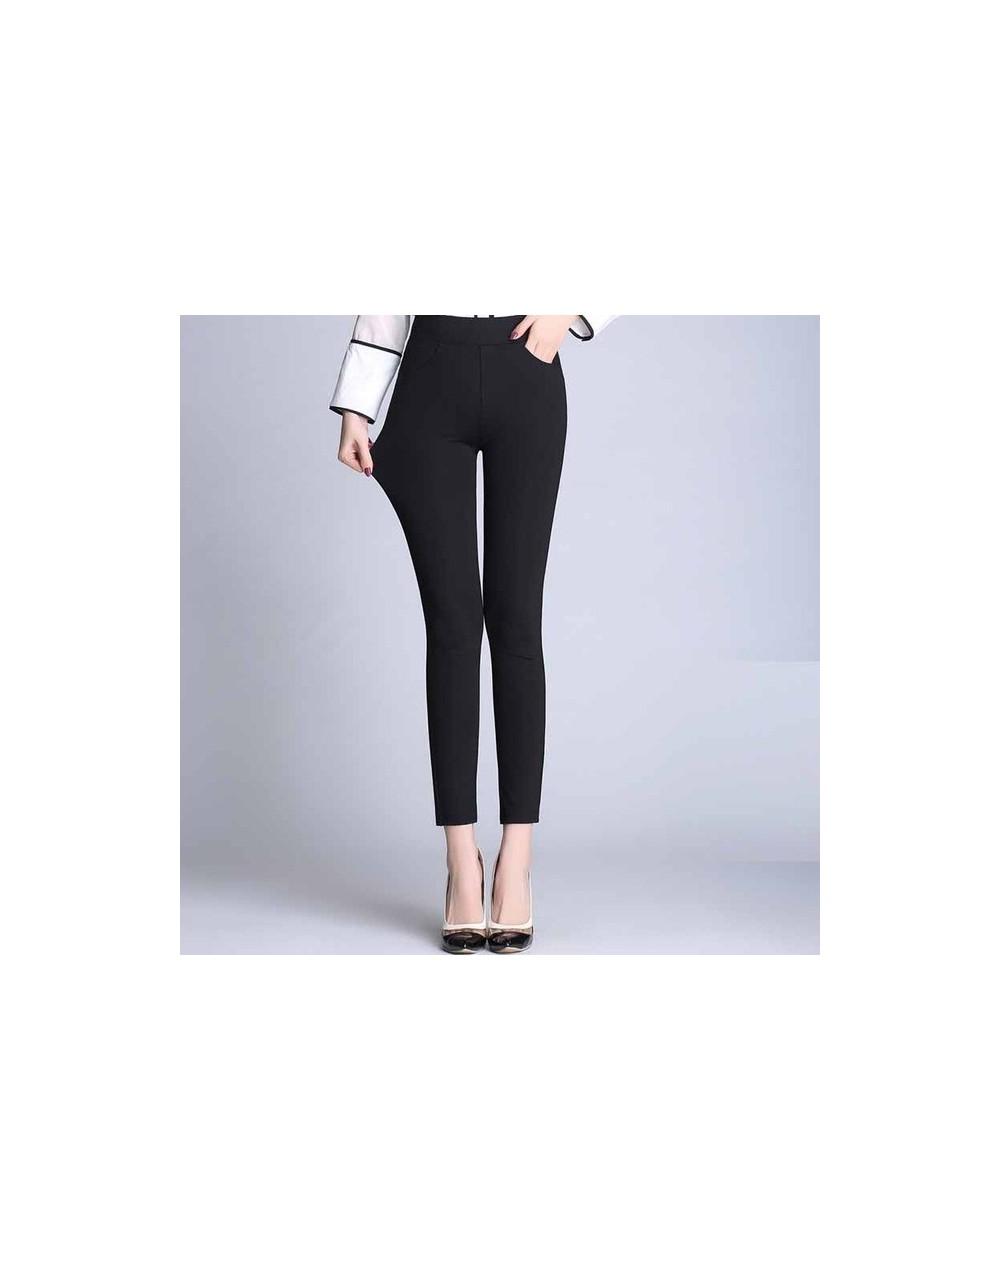 2017 Spring new fashion high waist strech pencil pants for women office OL style work wear skinny pants female vintage trous...